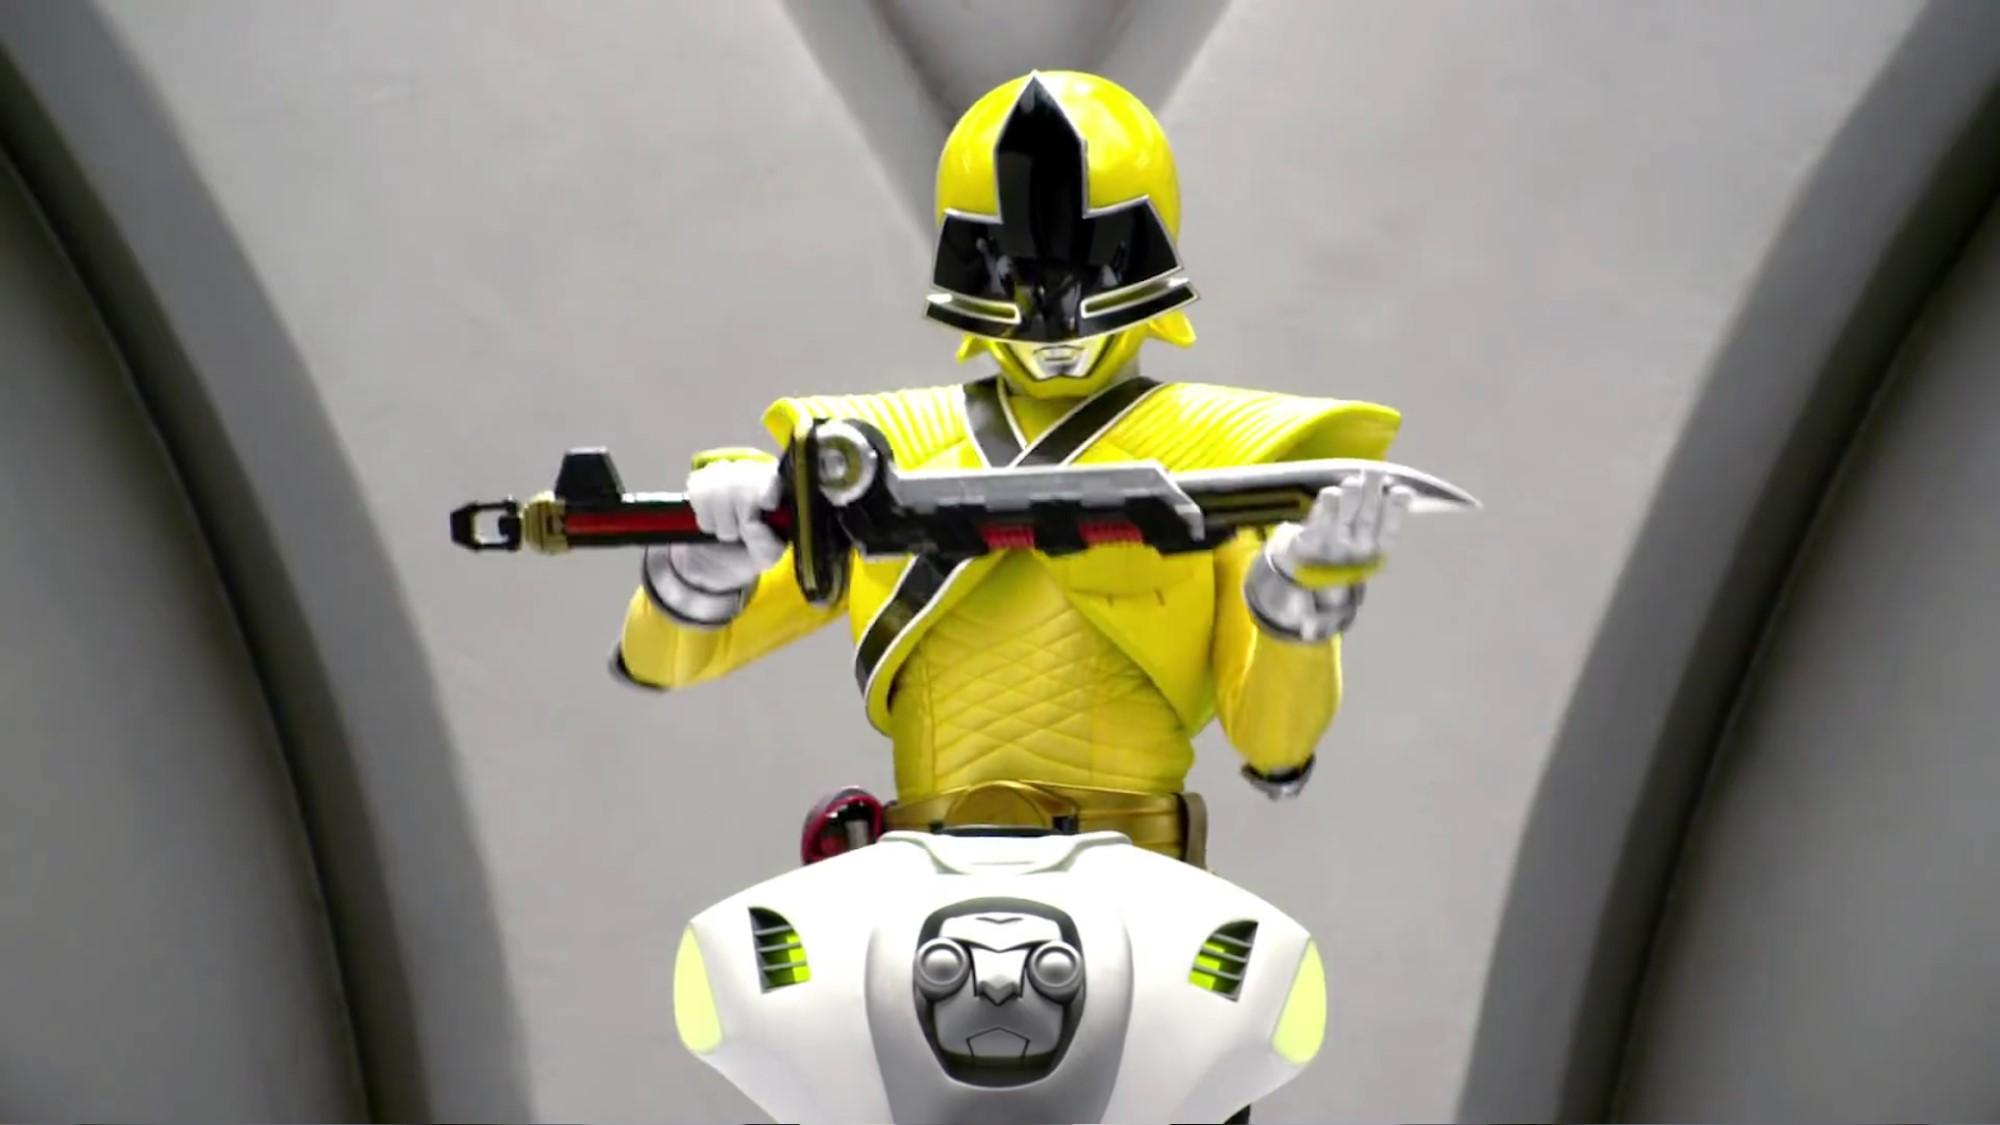 File:Samurai Yellow cockpit.jpg